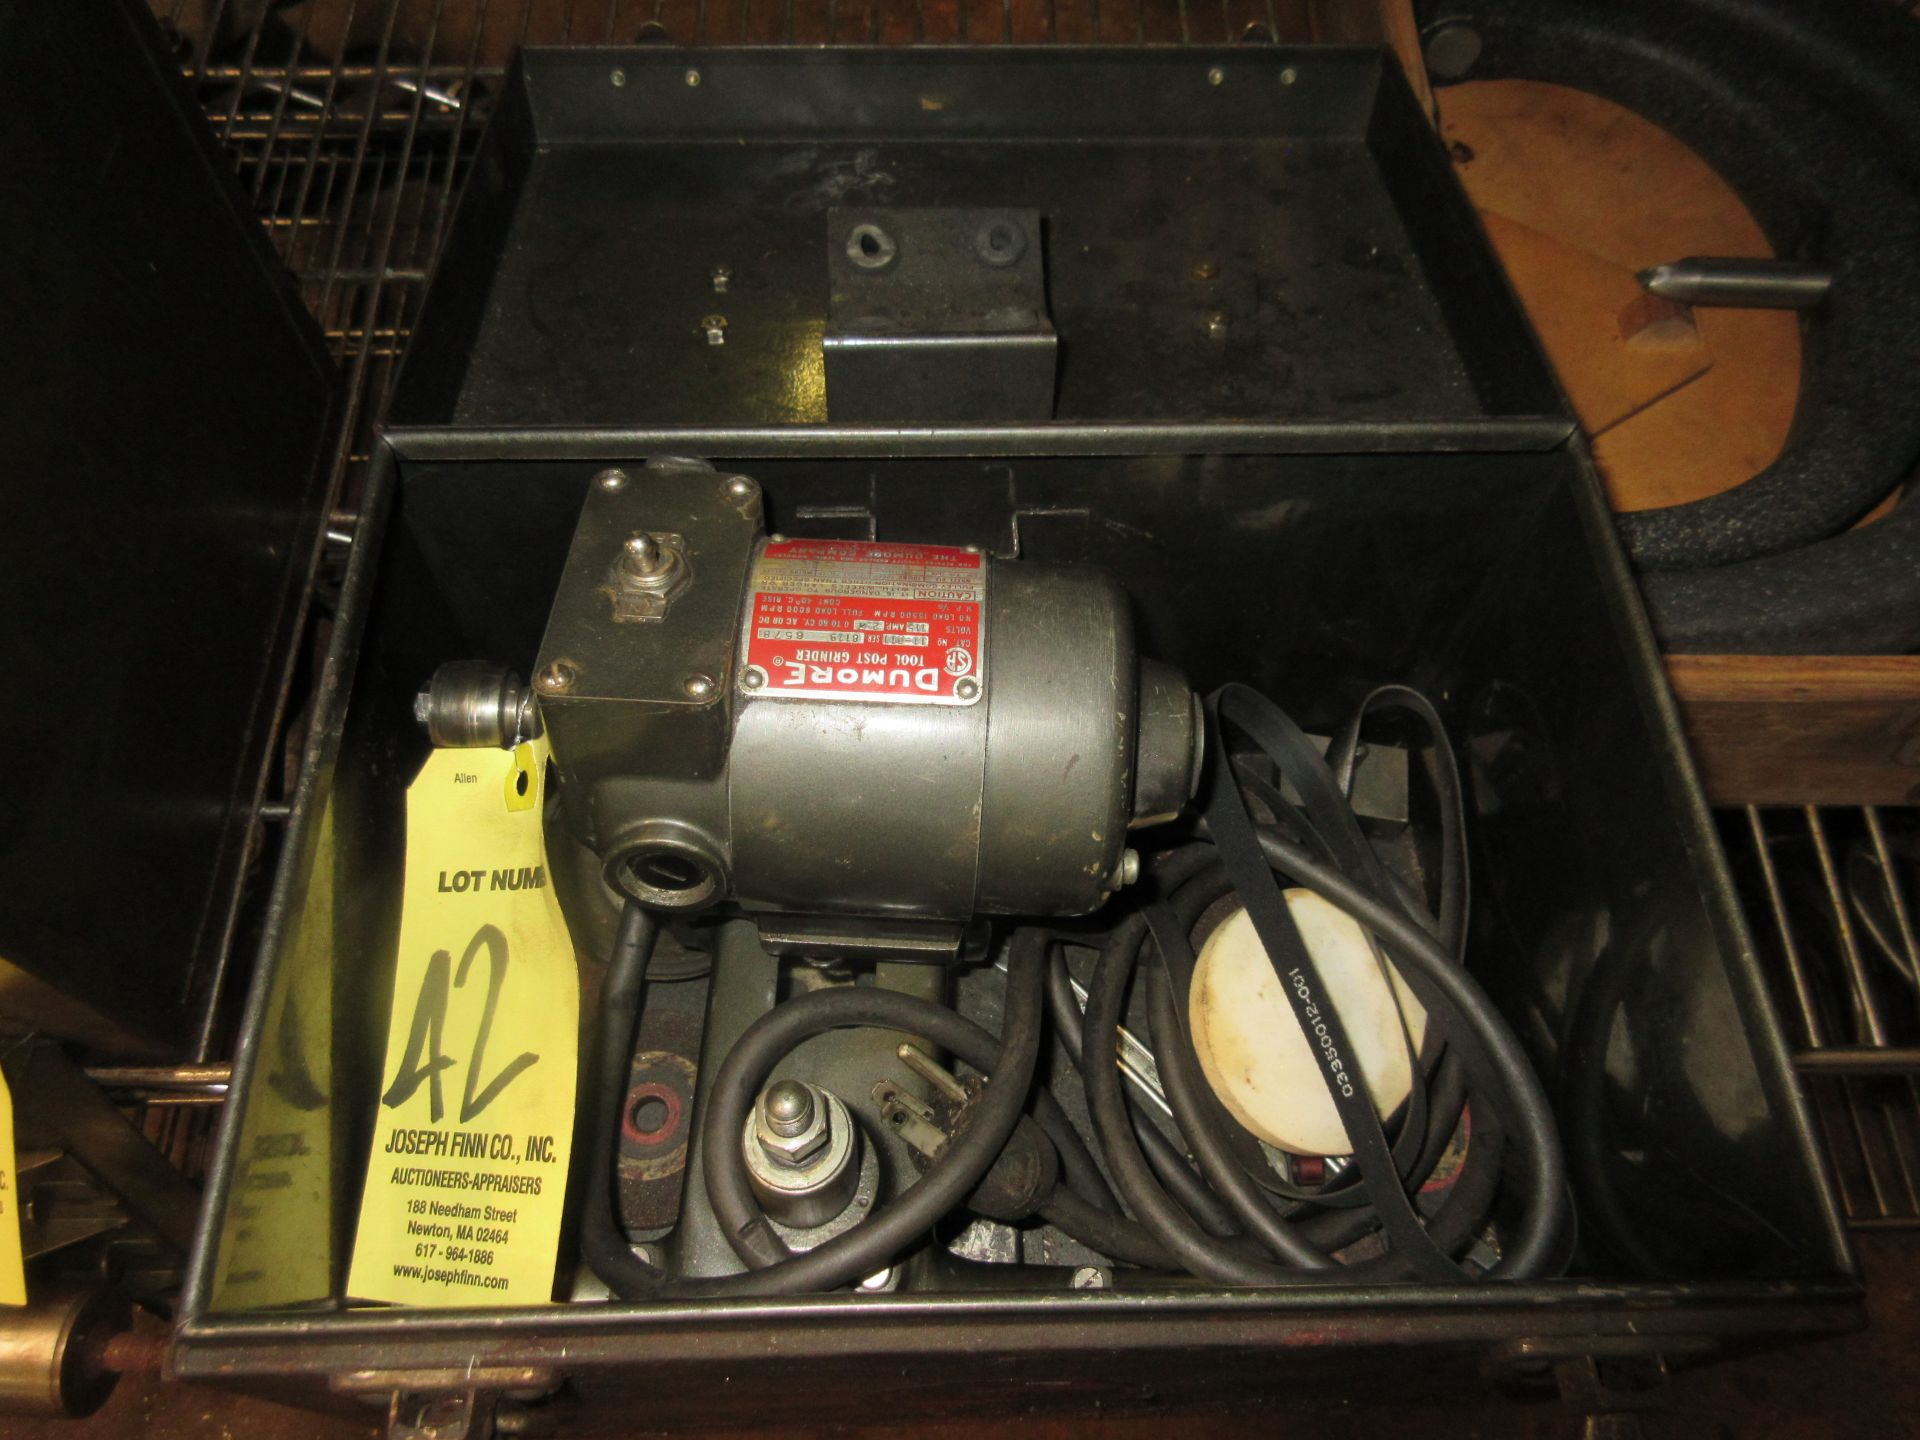 (1) Dumore Tool Post Grinder Cat #11-001, 1/5 HP, in Case